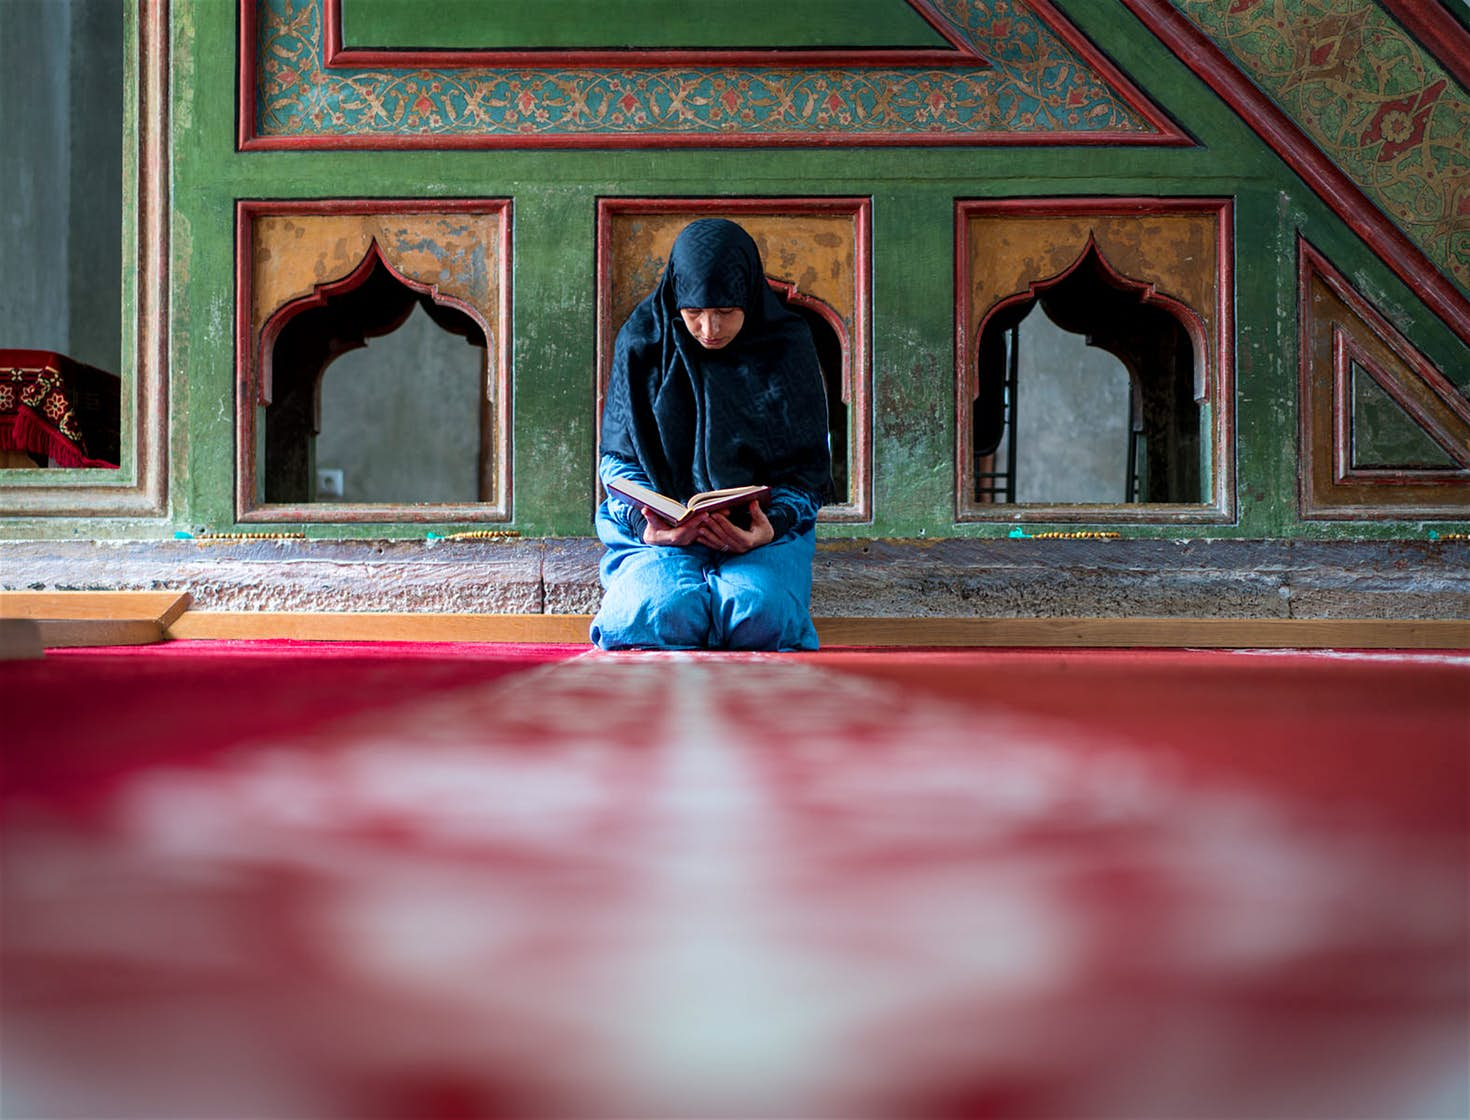 muslim-praying-ramadan-1bcb54c989ab.jpg